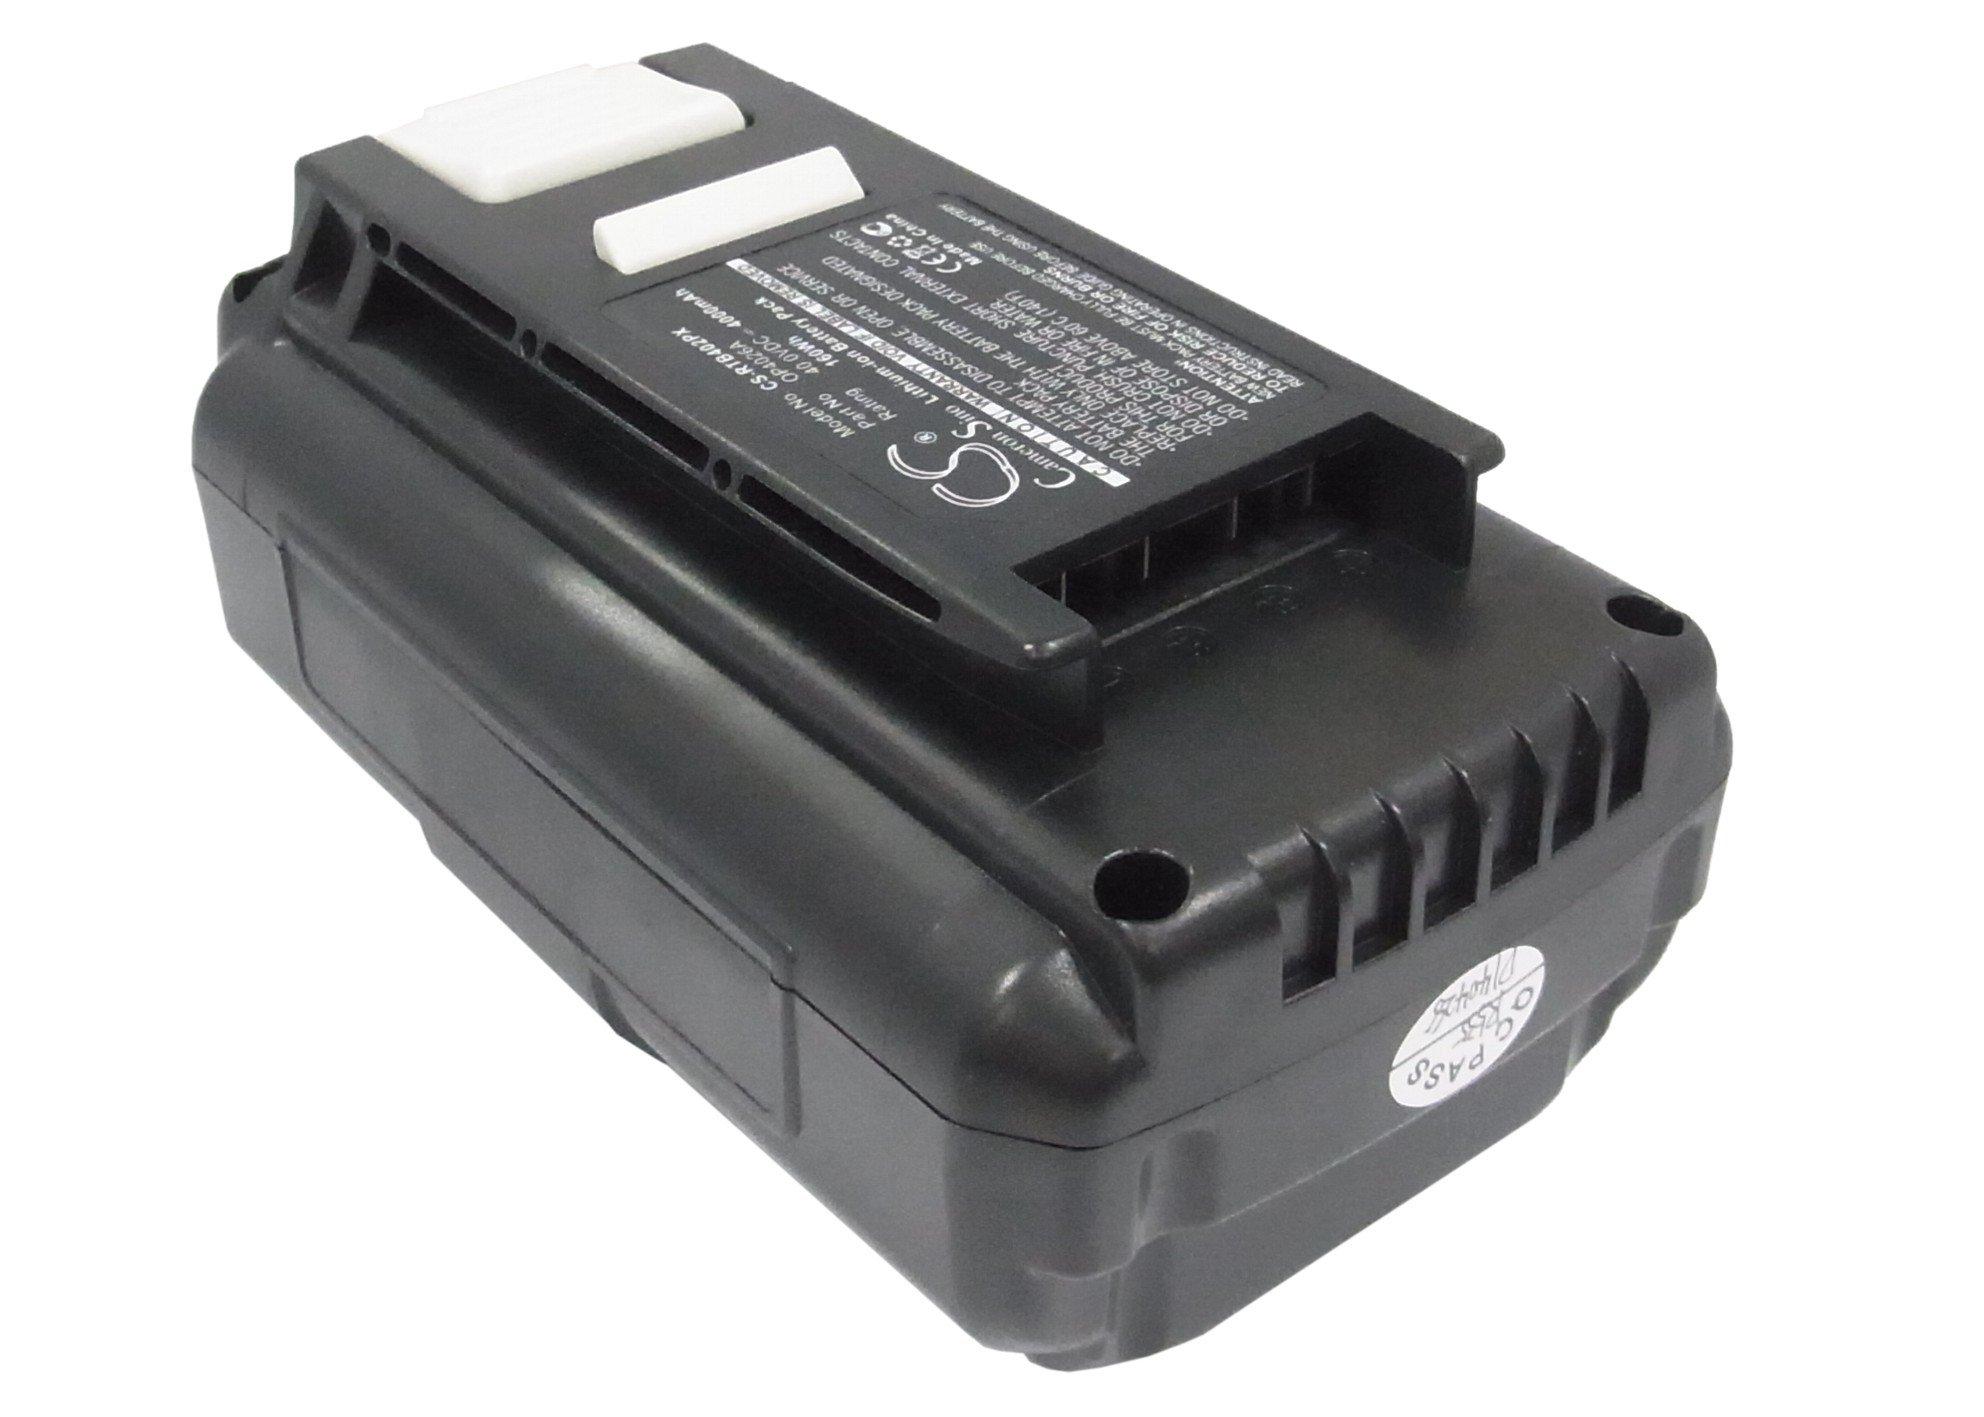 Pearanett 4000mAh / 160.0Wh Replacement Battery for Ryobi RY40500 by Pearanett